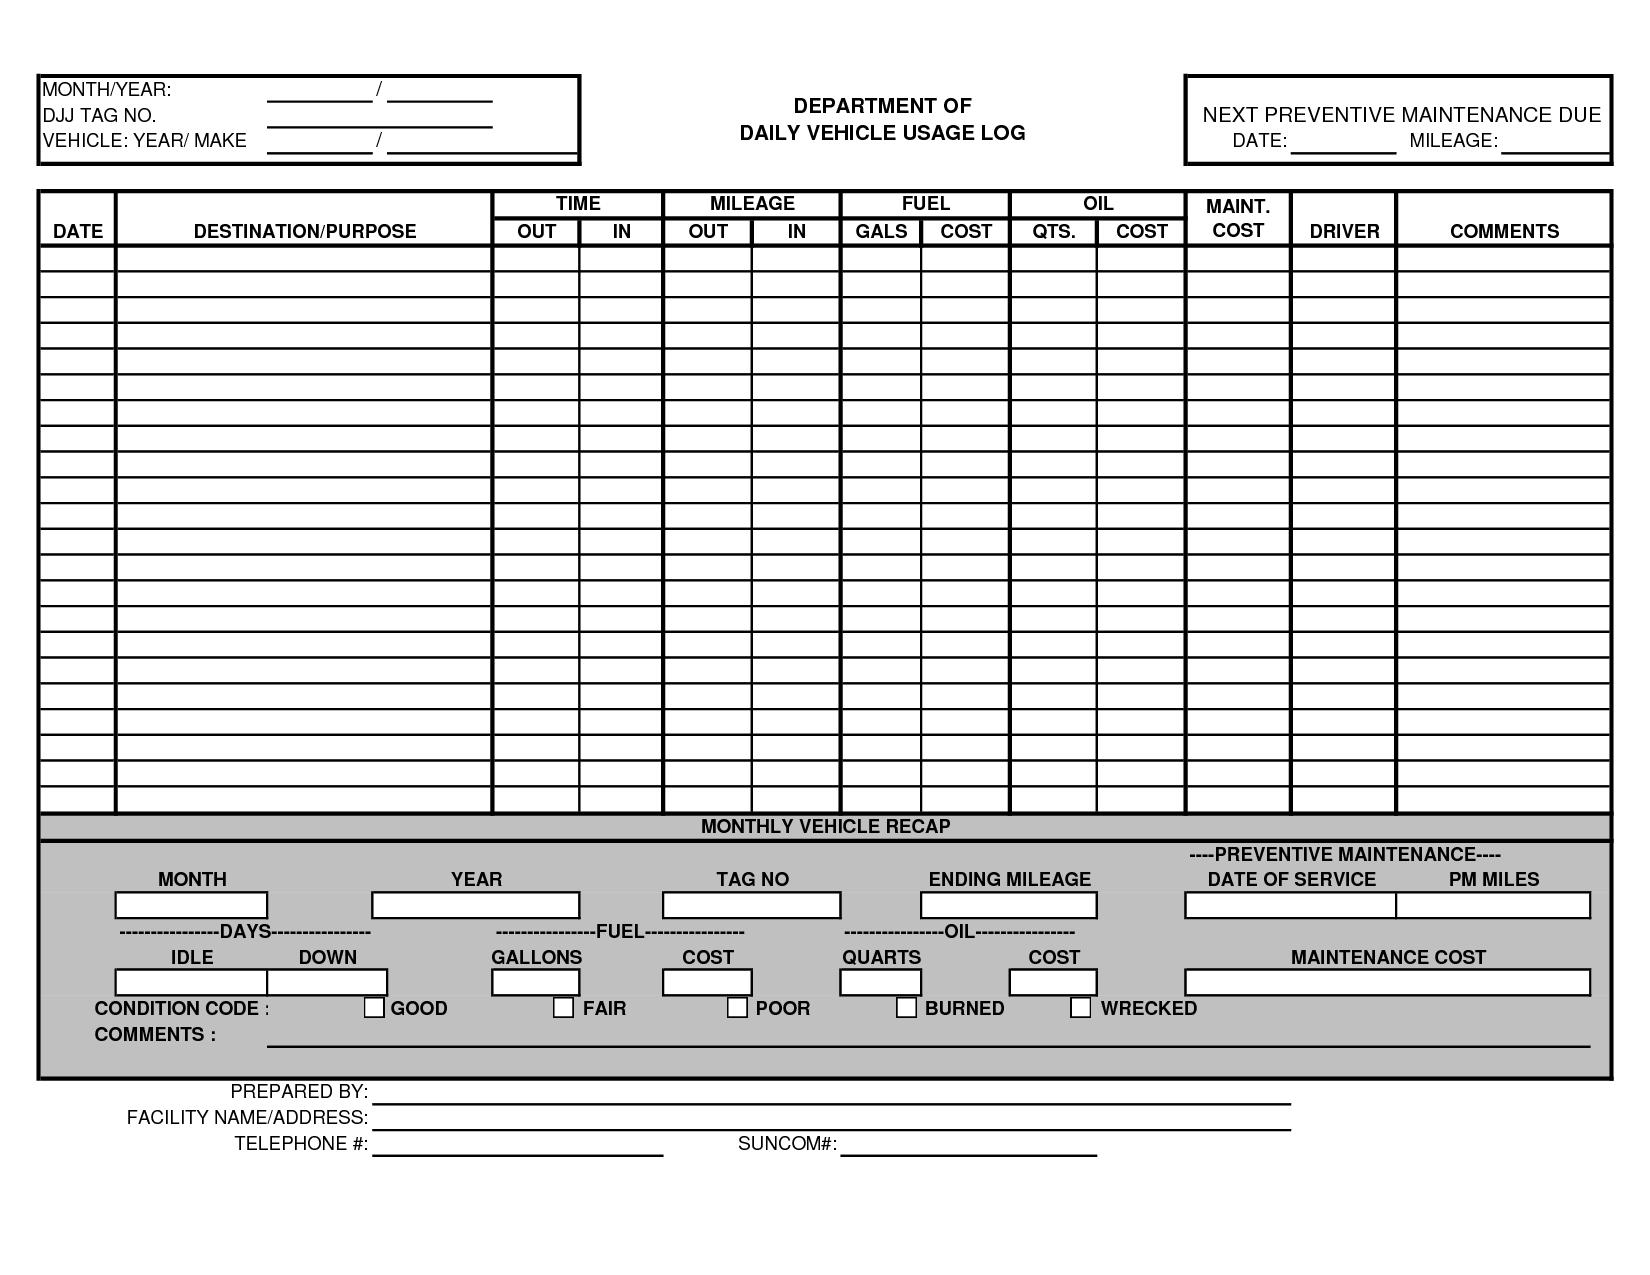 Fleet Services Vehicle Repair Worksheet Printable Worksheets And Activities For Teachers Parents Tutors And Homeschool Families